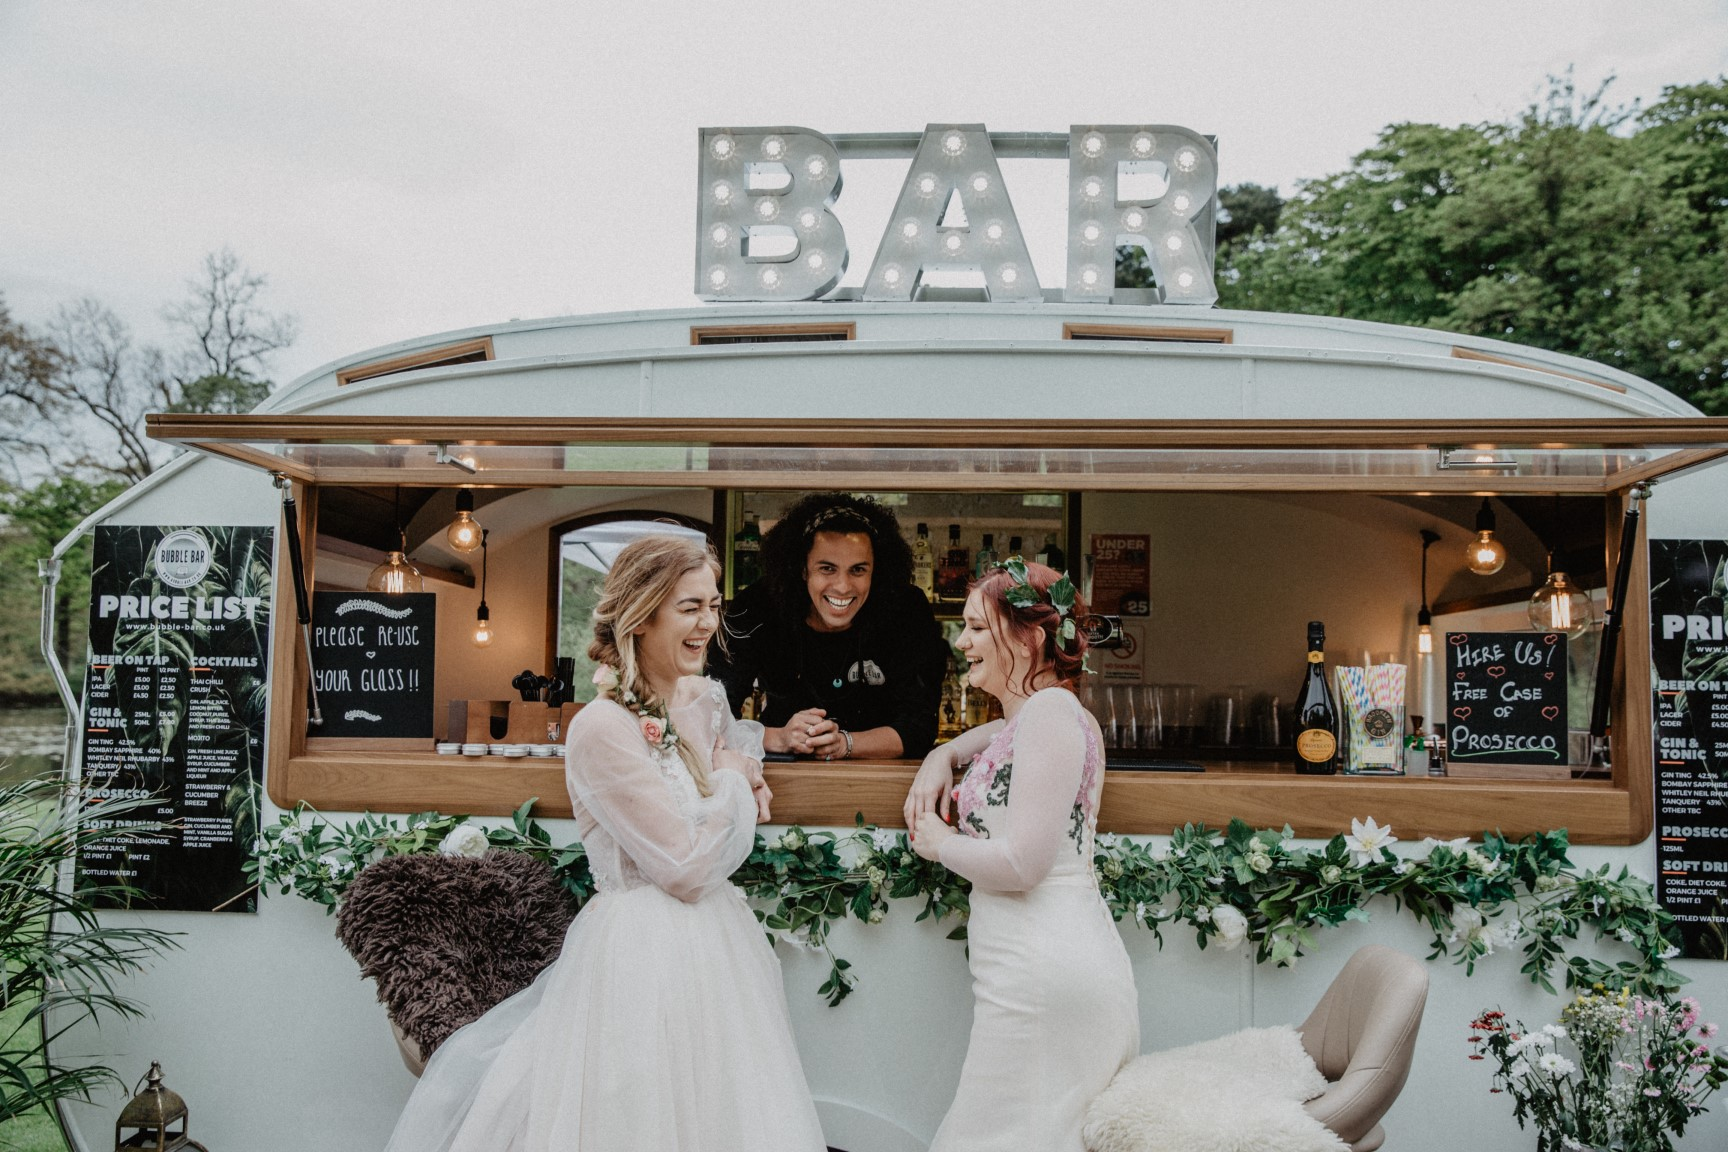 the bubble bar- meadow vale wedding fair-unique nottingham wedding fair- nottingham wedding fair- Nottingham alternative wedding fair- unique wedding fairs- unconventional wedding-